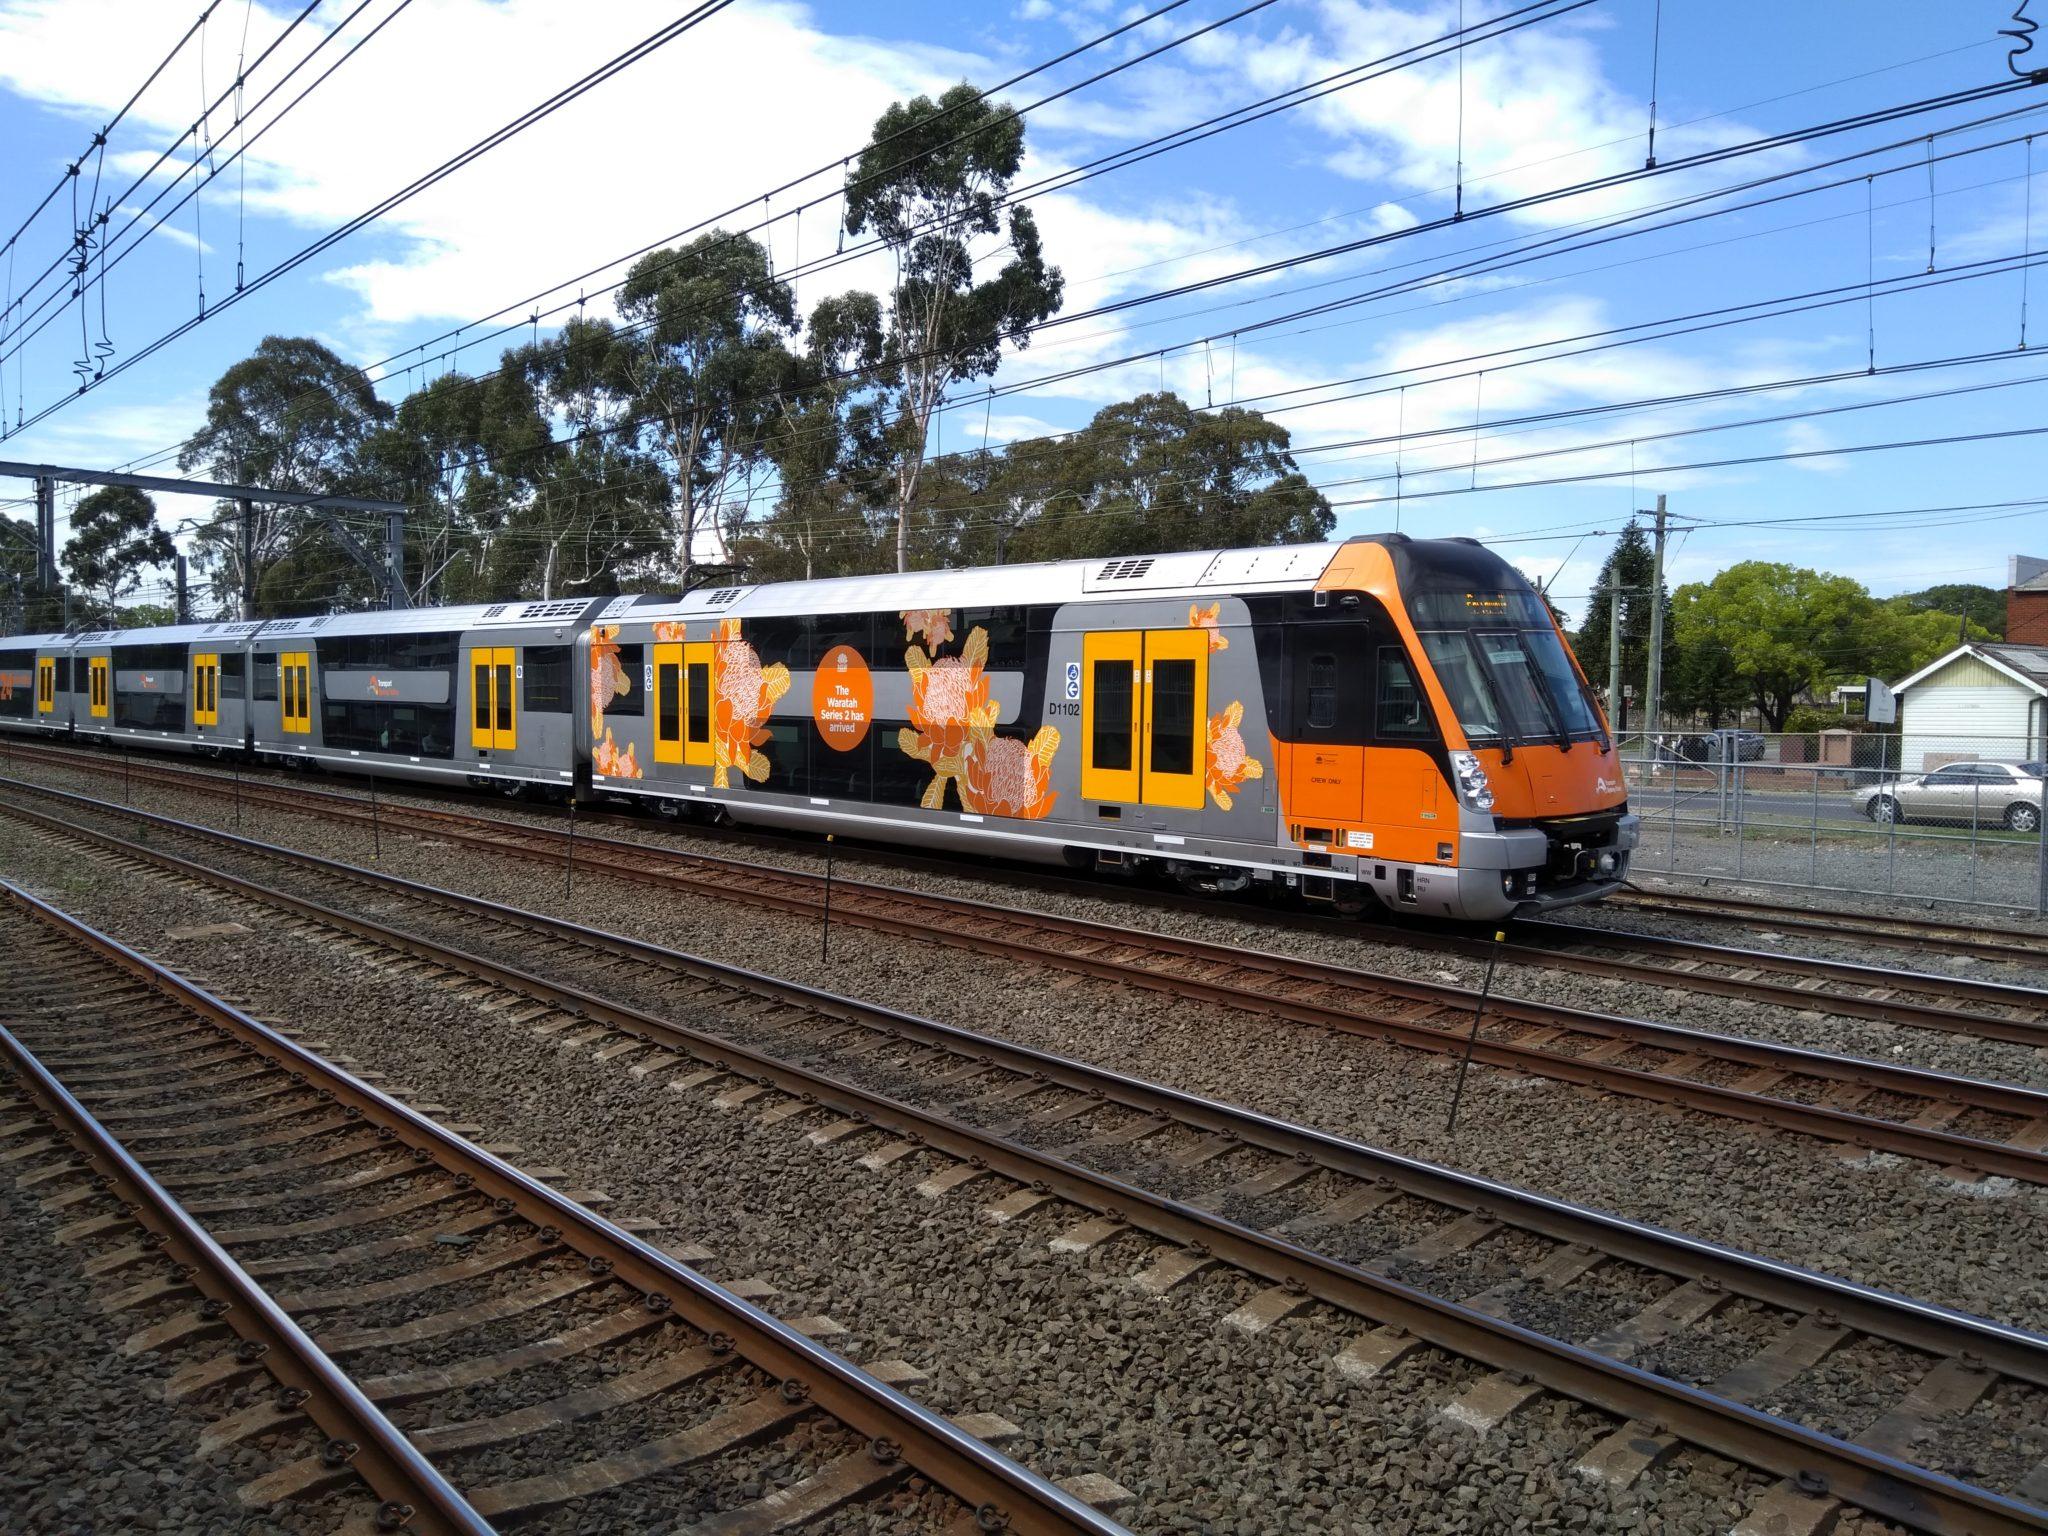 Sydney double-decker train